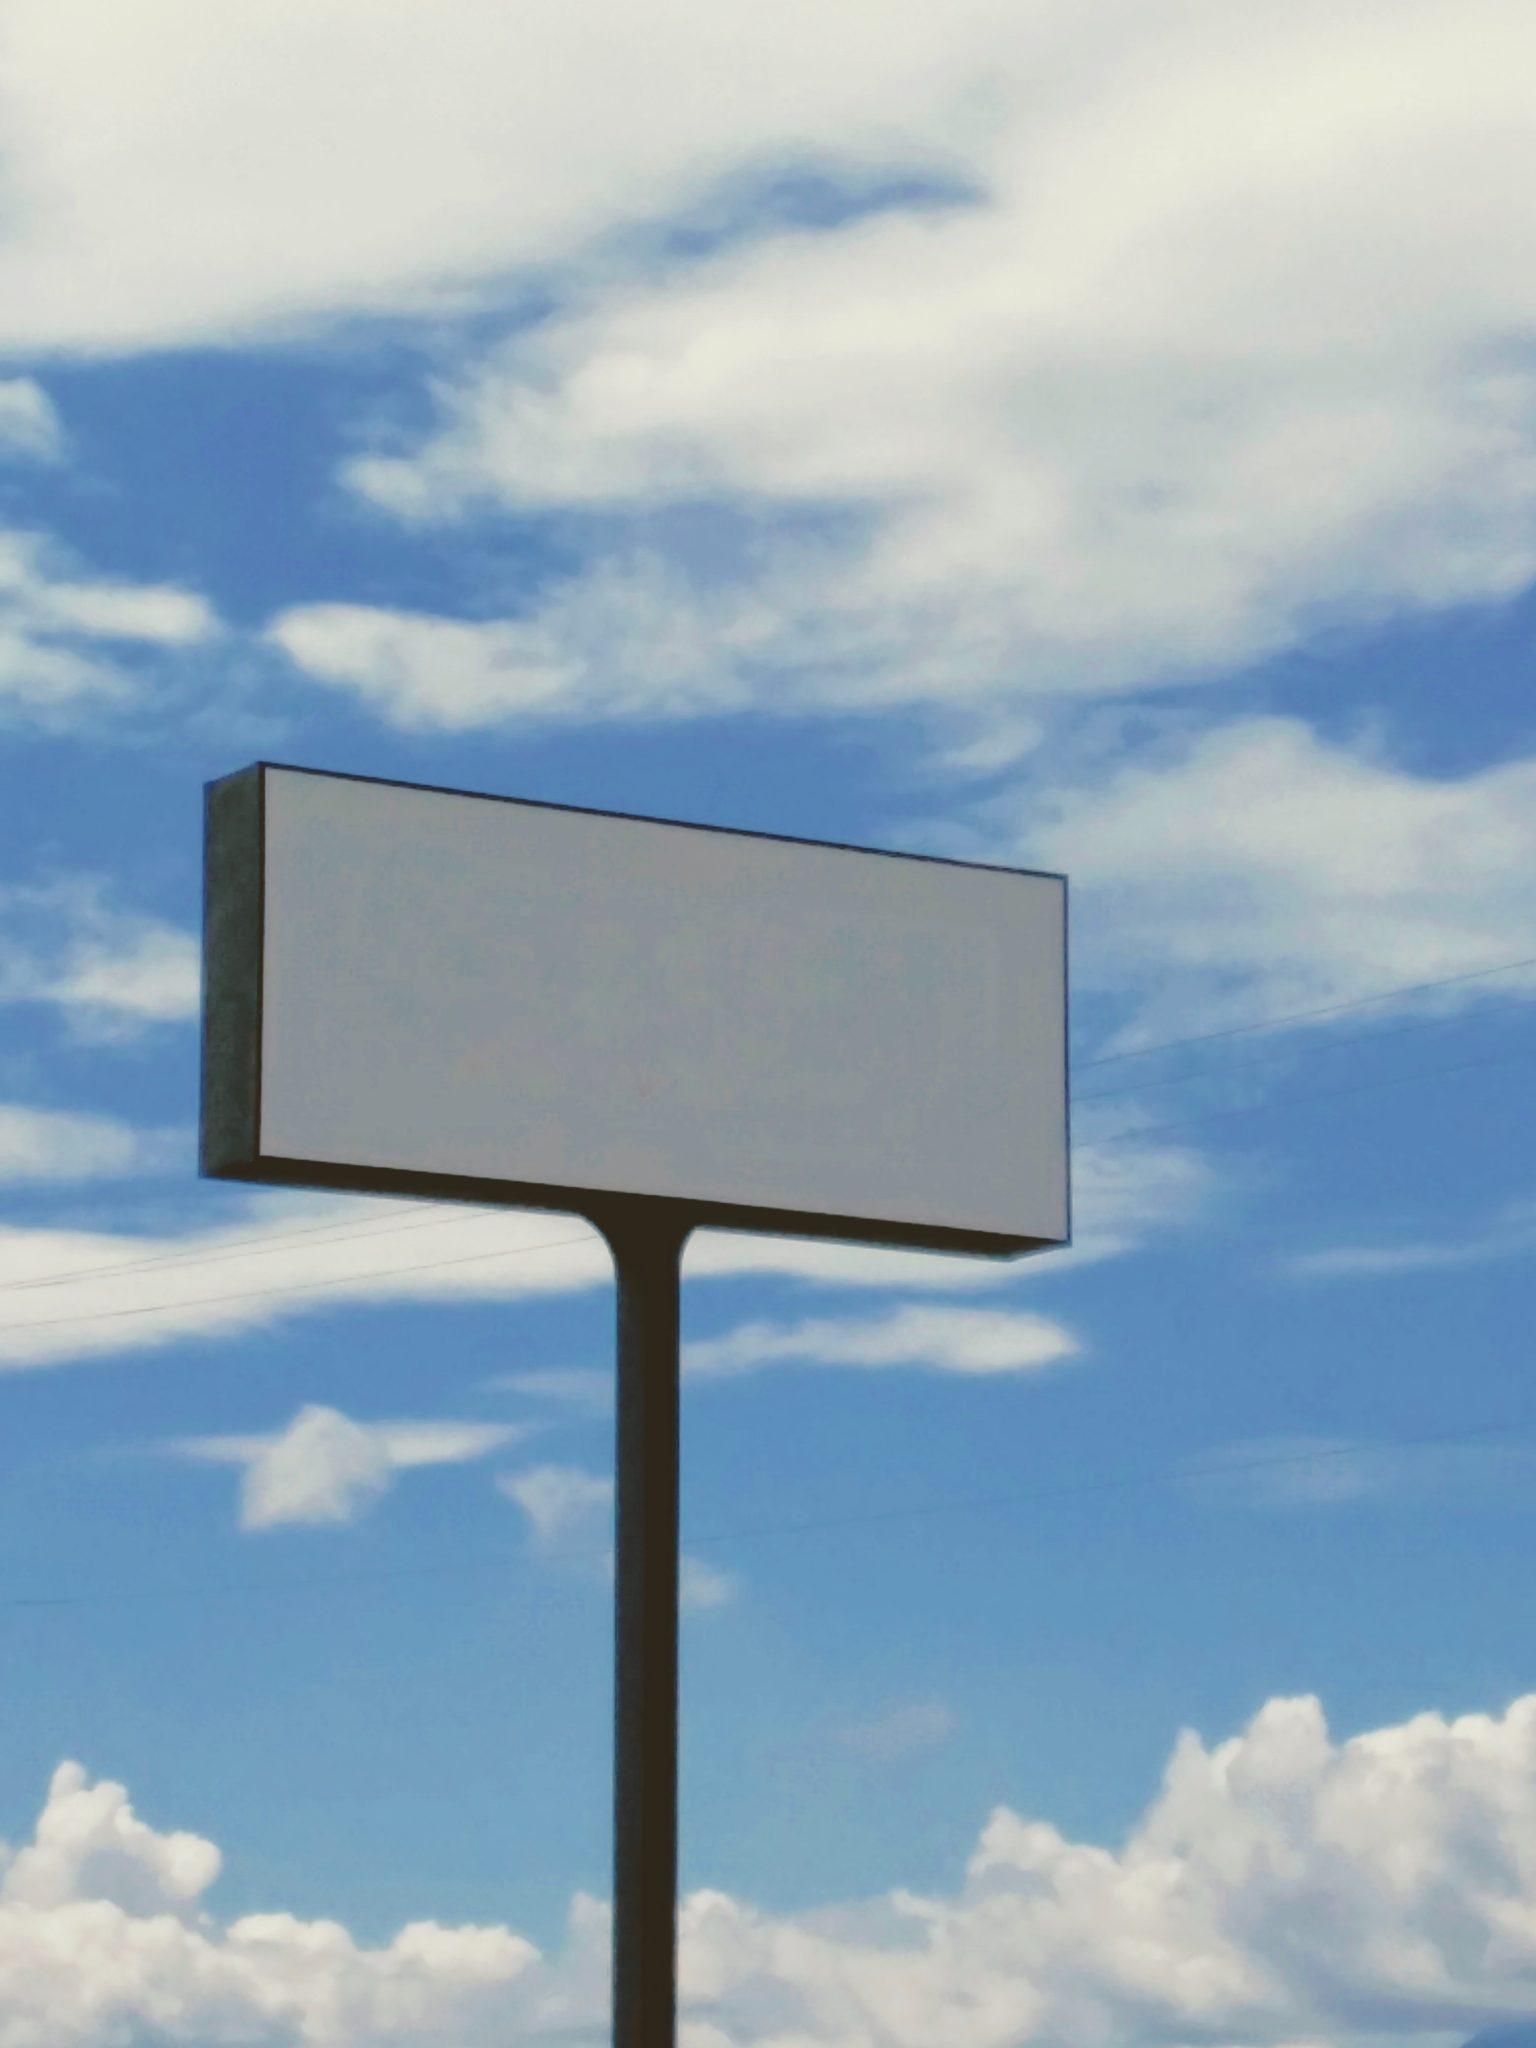 Empty billboard for marketing.